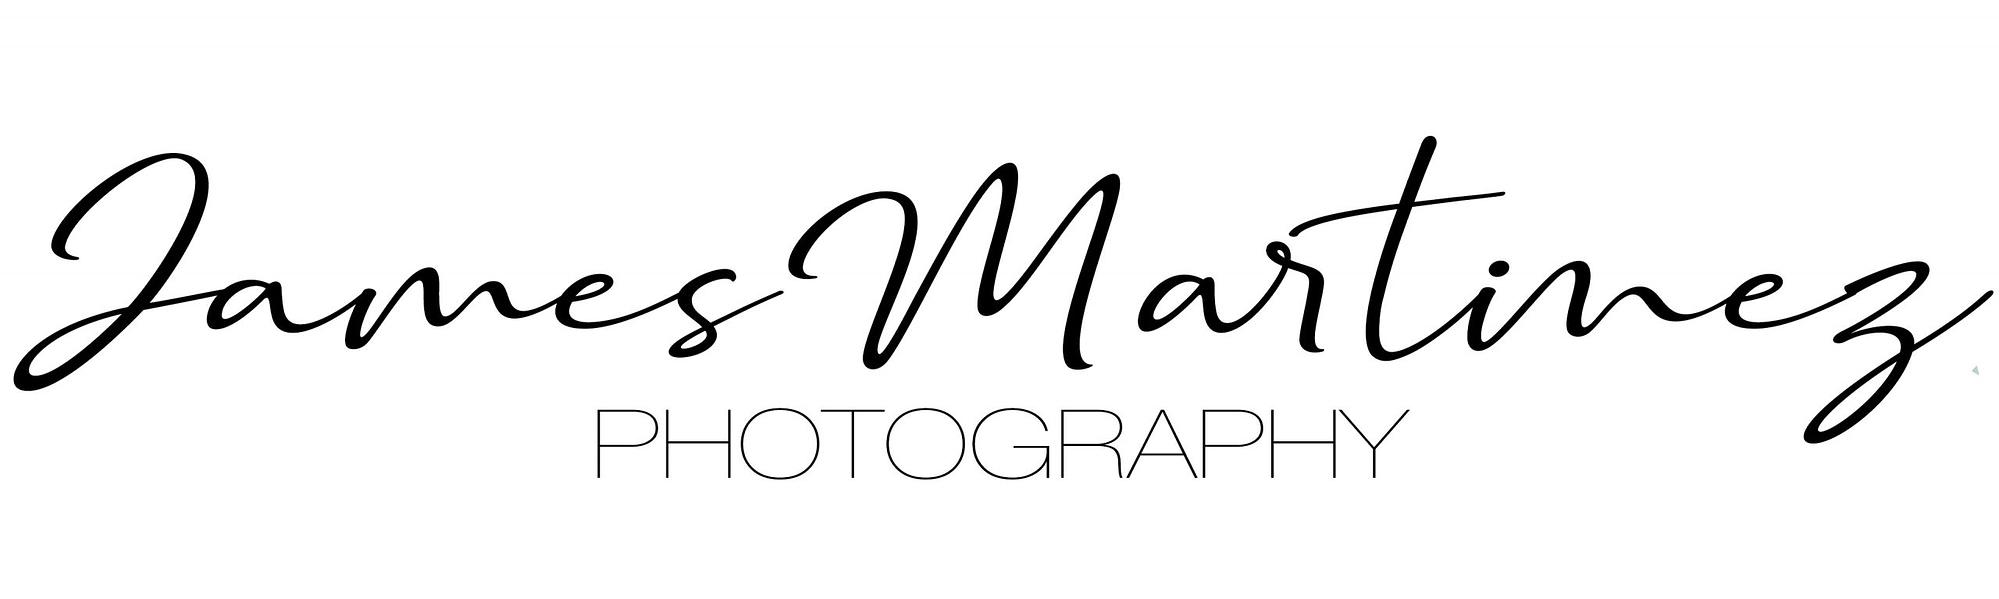 James Martinez Photography - NFT